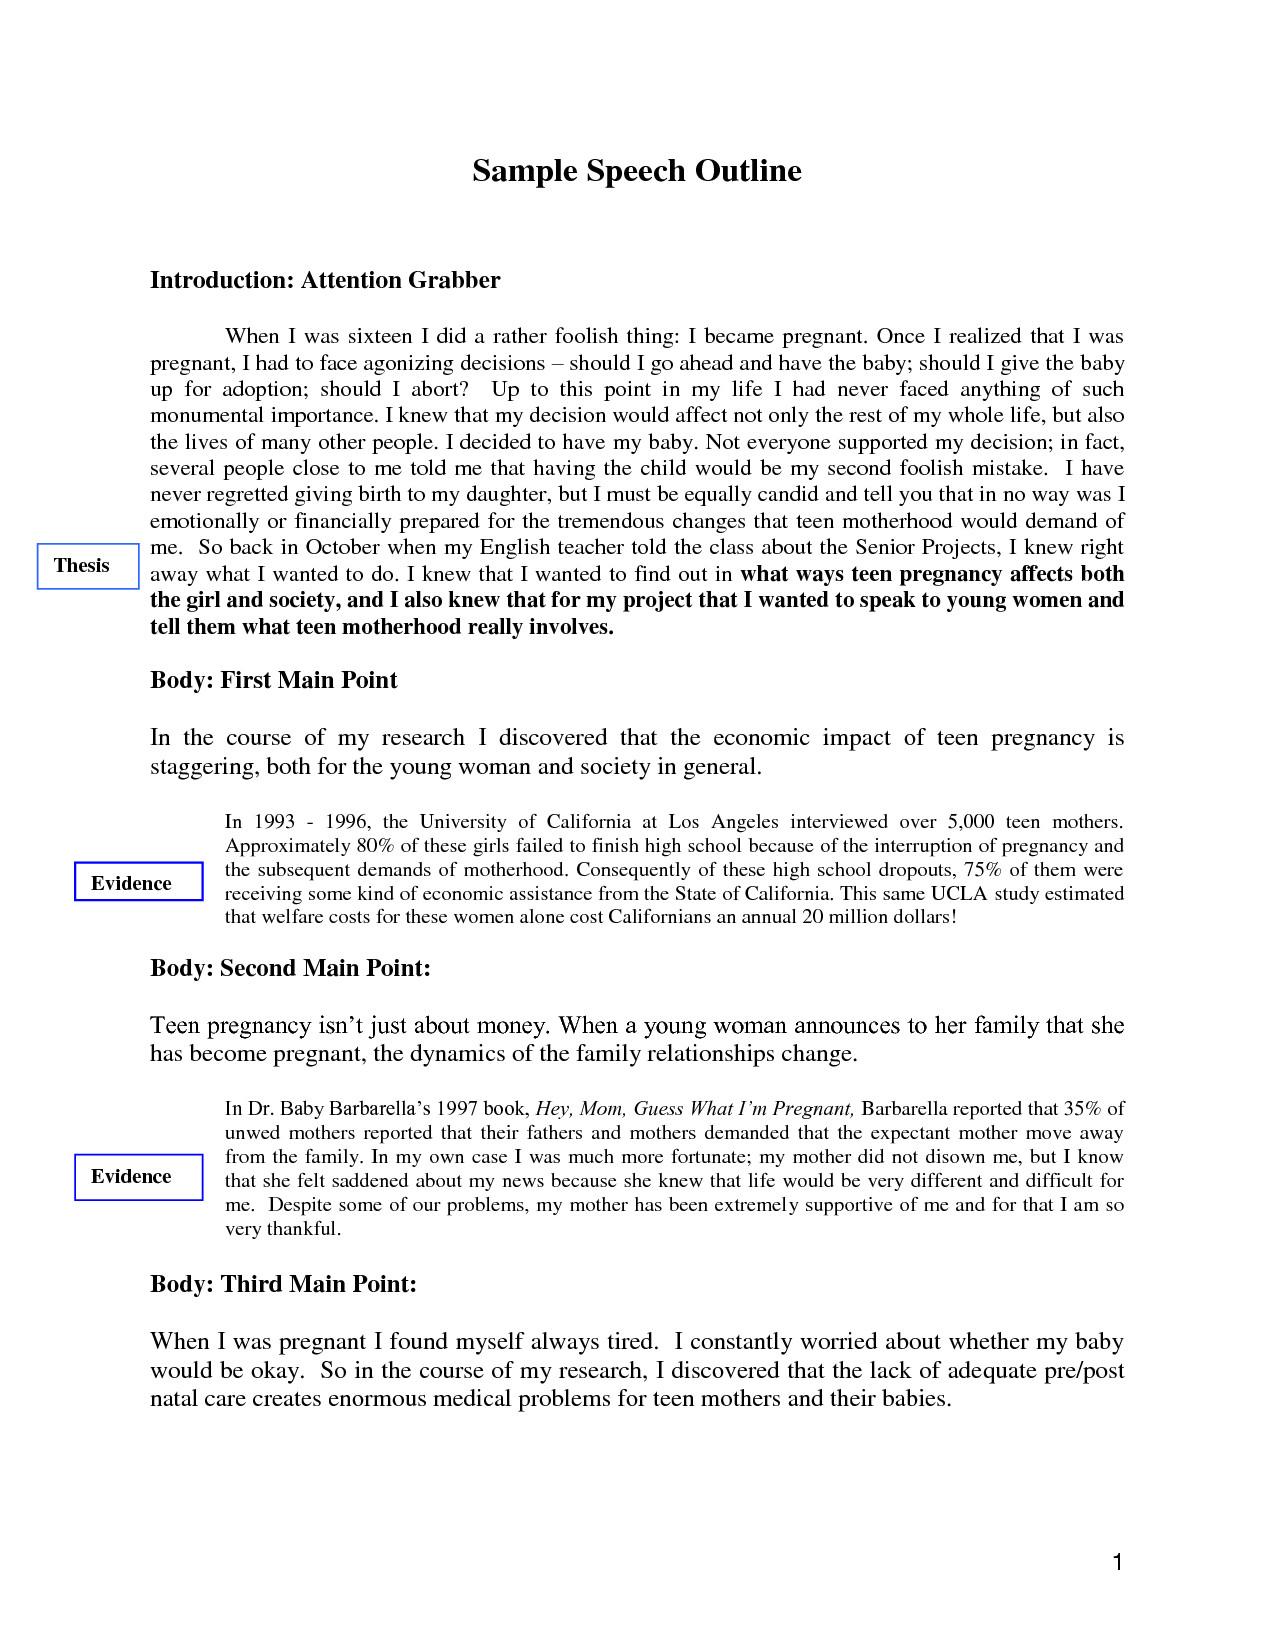 Self Introduction Speech Outline Sample Self Introduction Speech Outline